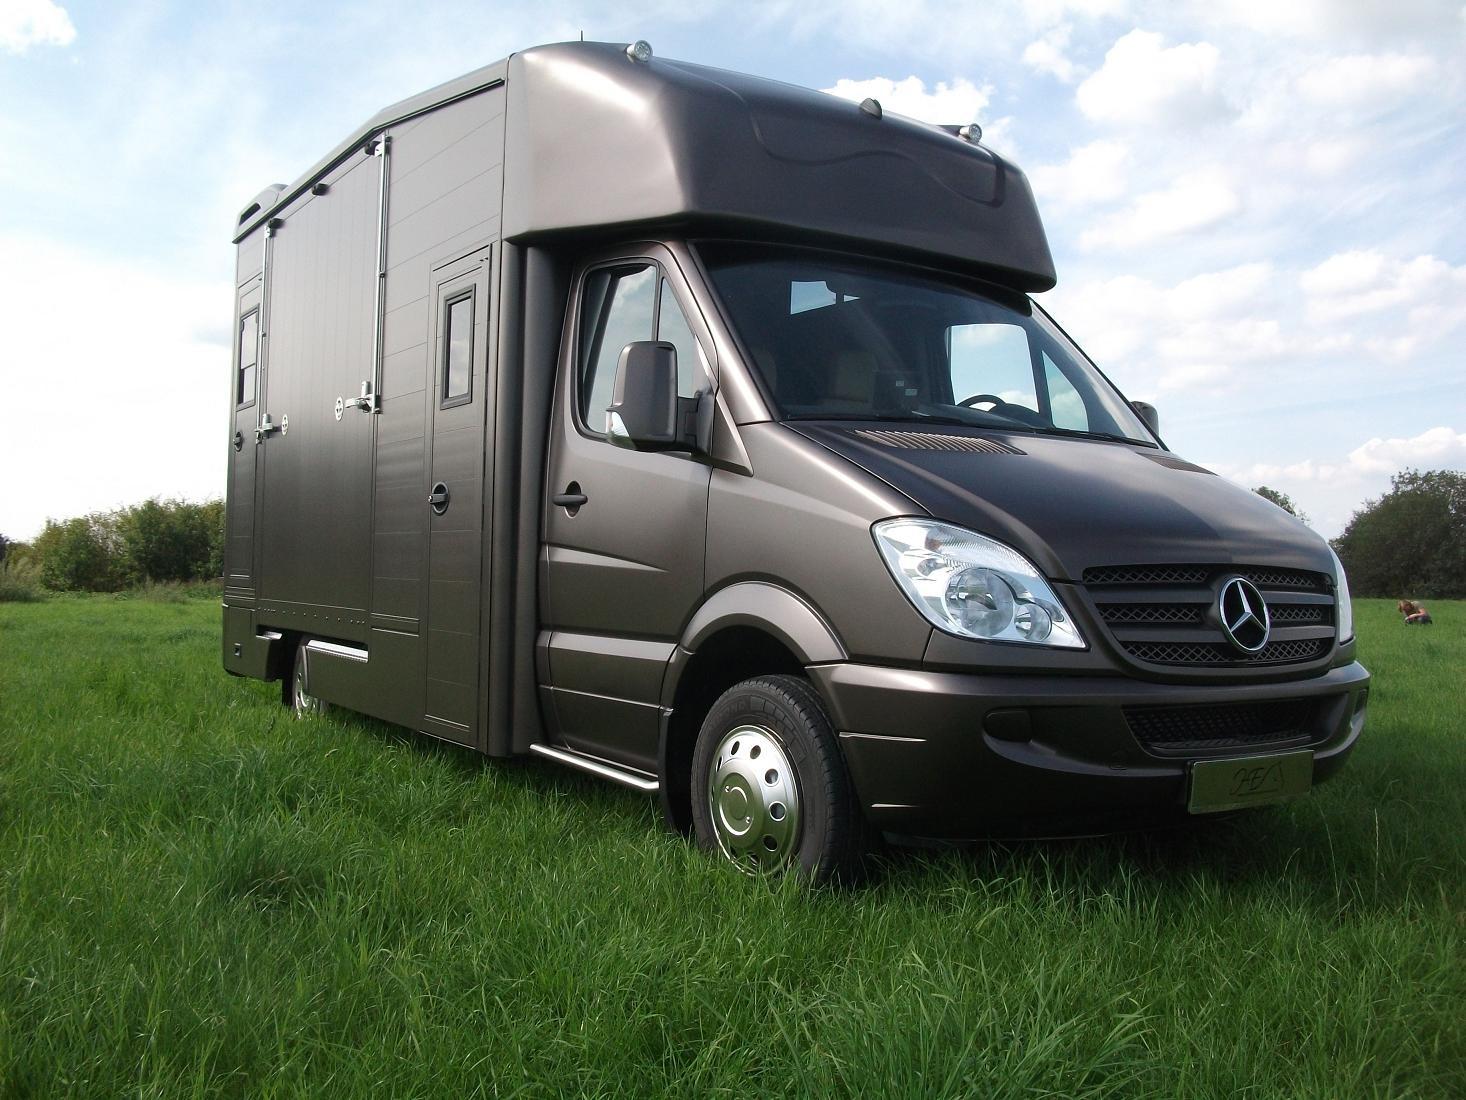 mercedes benz sprinter 519 superior class. Black Bedroom Furniture Sets. Home Design Ideas